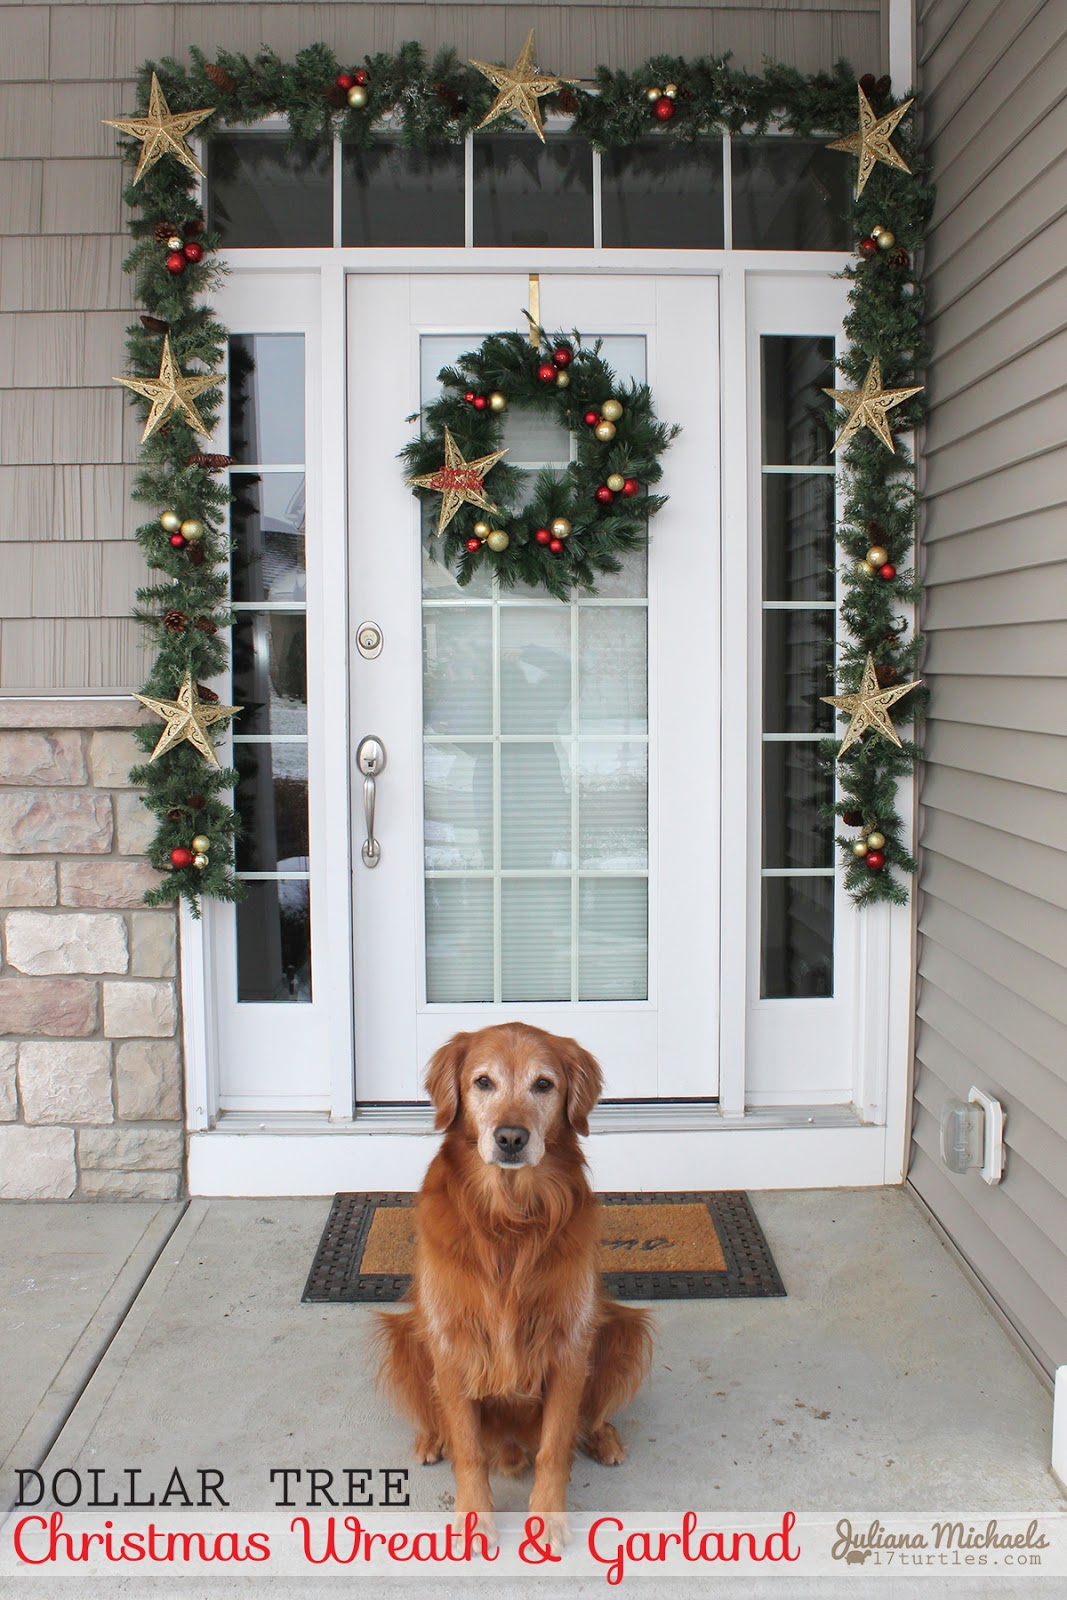 Dollar Tree Christmas Wreath And Garland 17turtles